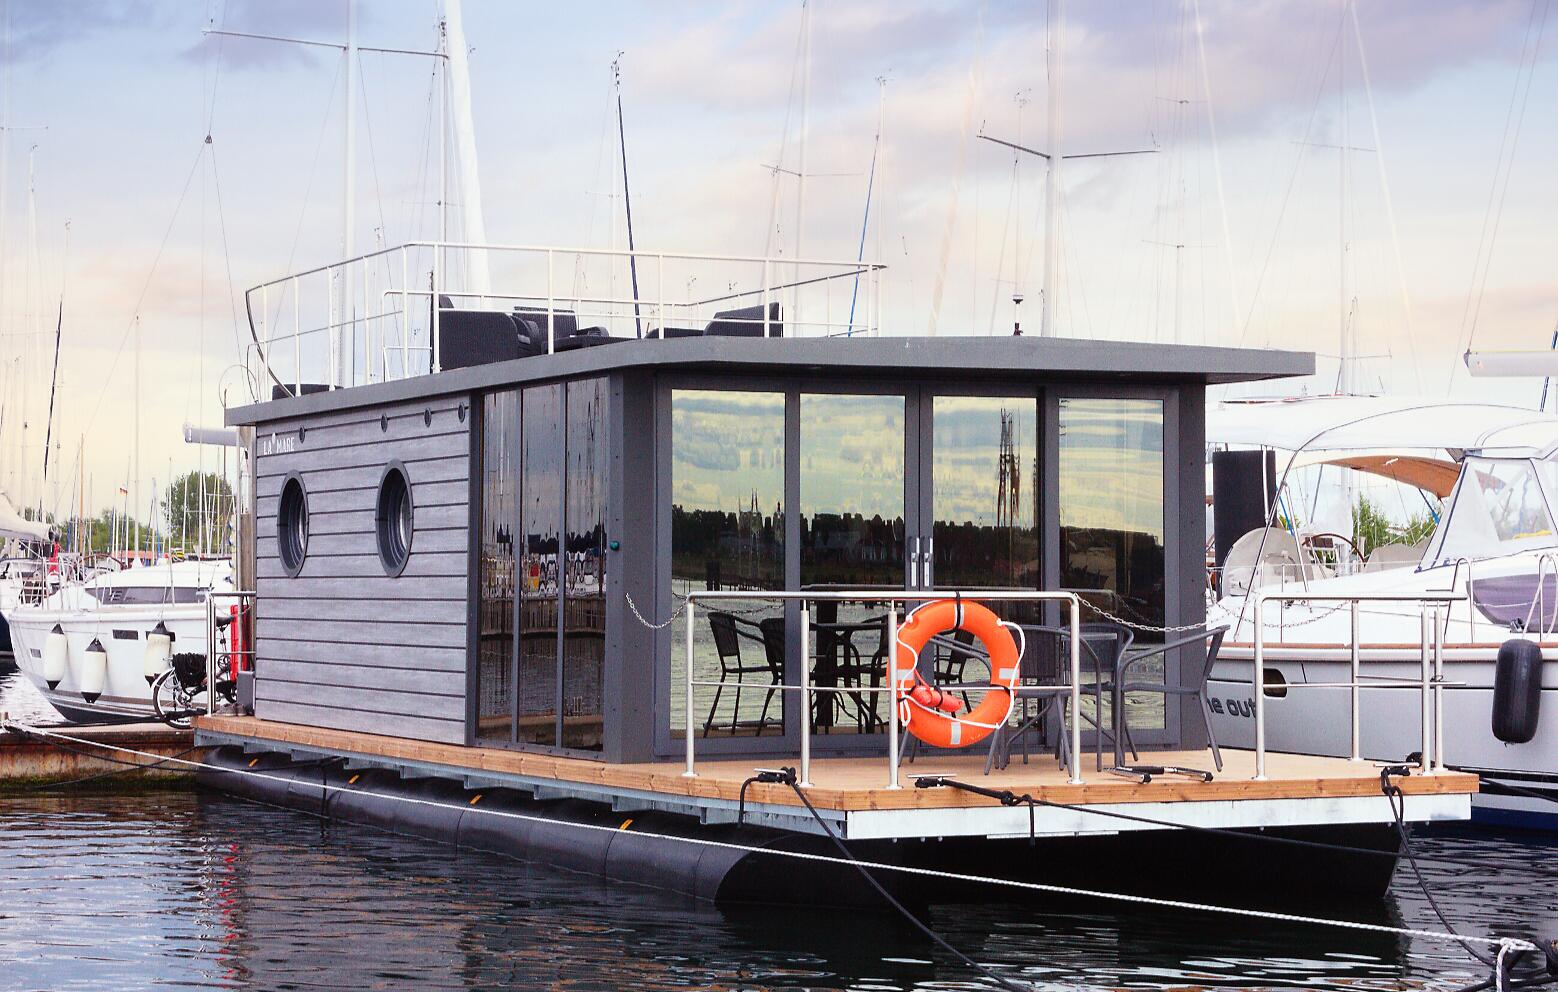 hausboot-kurzulaub-ohne-sauna-5-tage-4-uen-4-personen-bg5